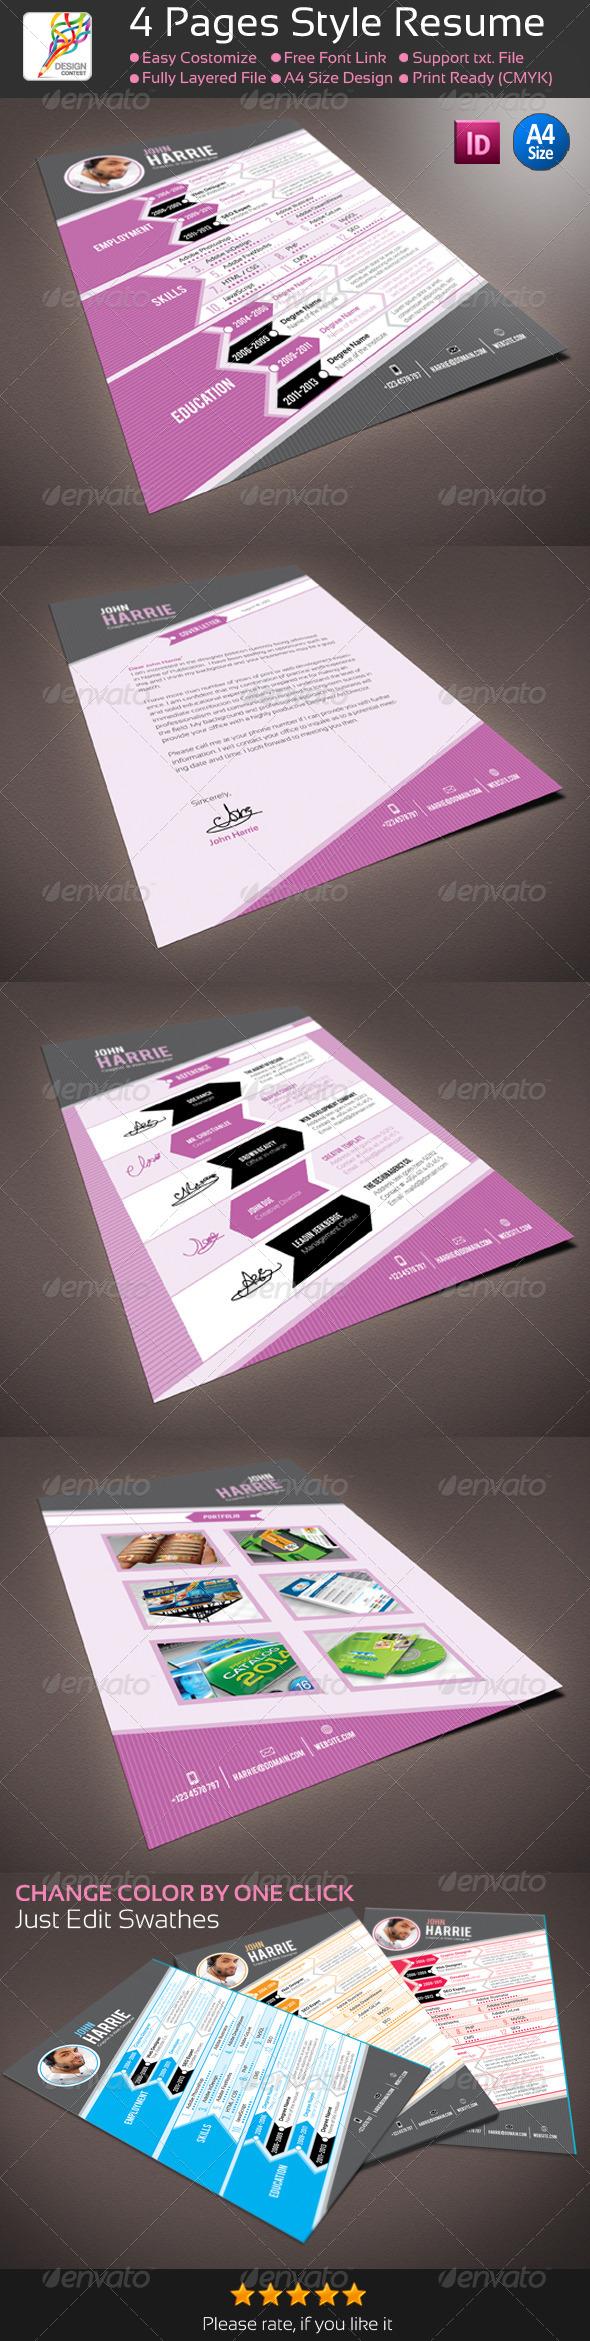 4 pages indesign style resume cv best resume cv indesign 4 pages indesign style resume cv reheart Choice Image